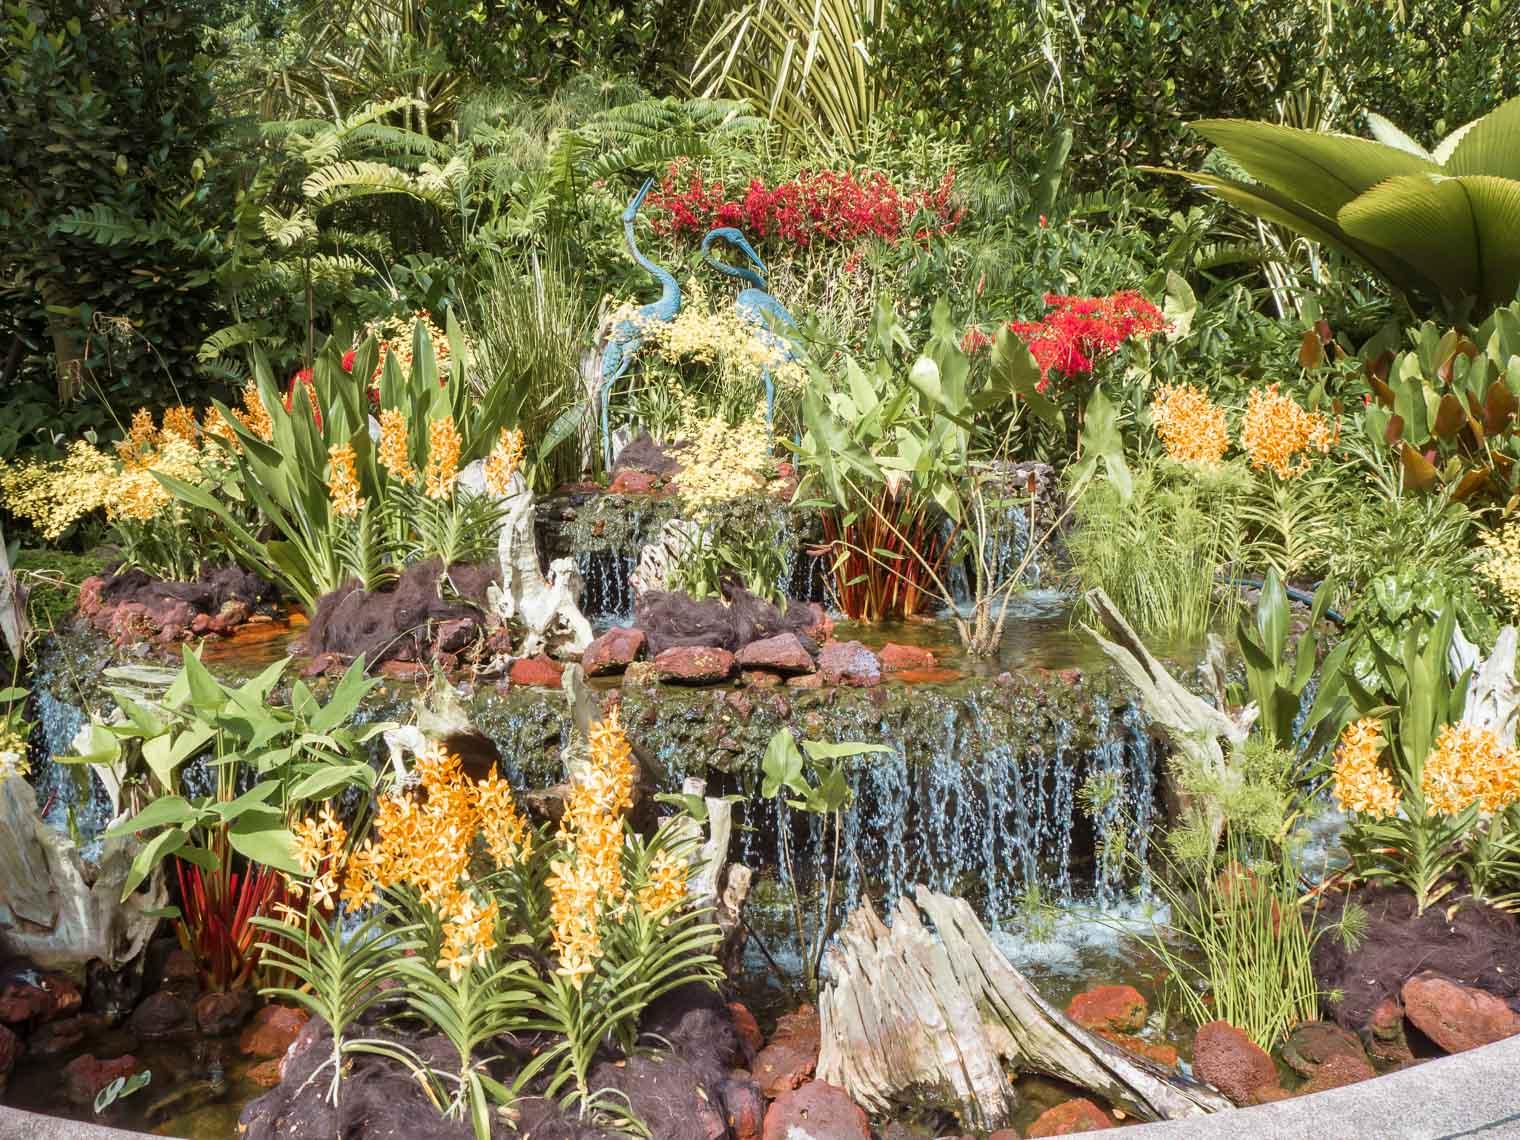 Orchids at Botanical Gardens Singapore